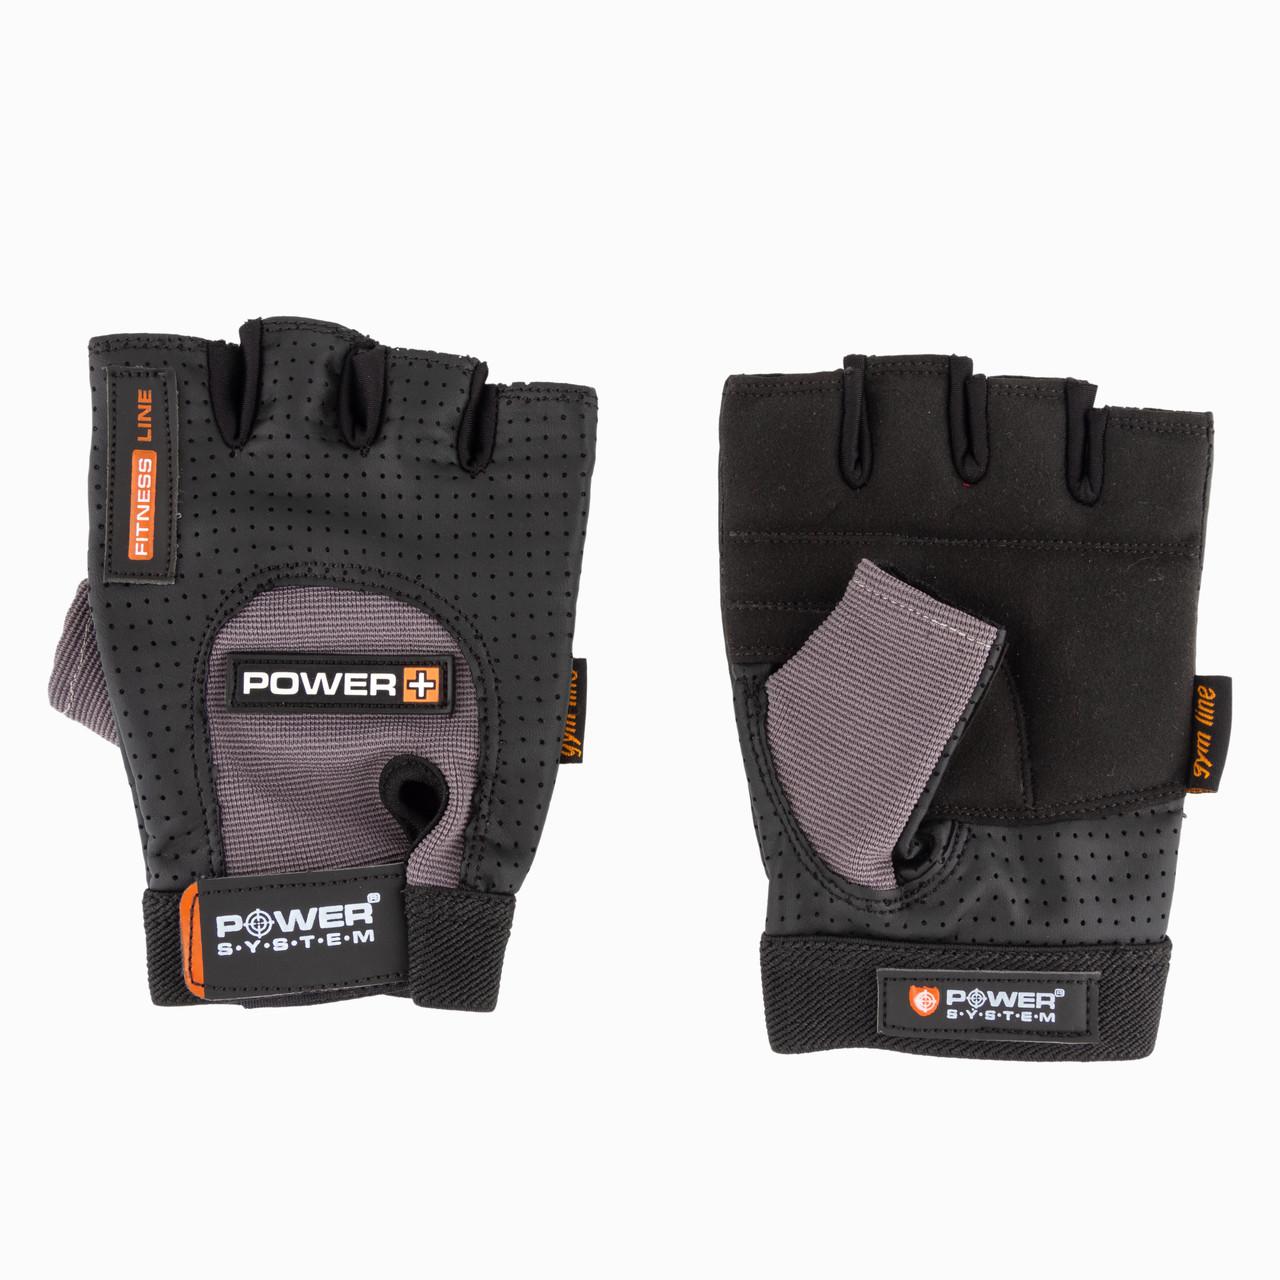 Рукавички для фітнесу і важкої атлетики Power System Power Plus PS-2500 Black/Grey M